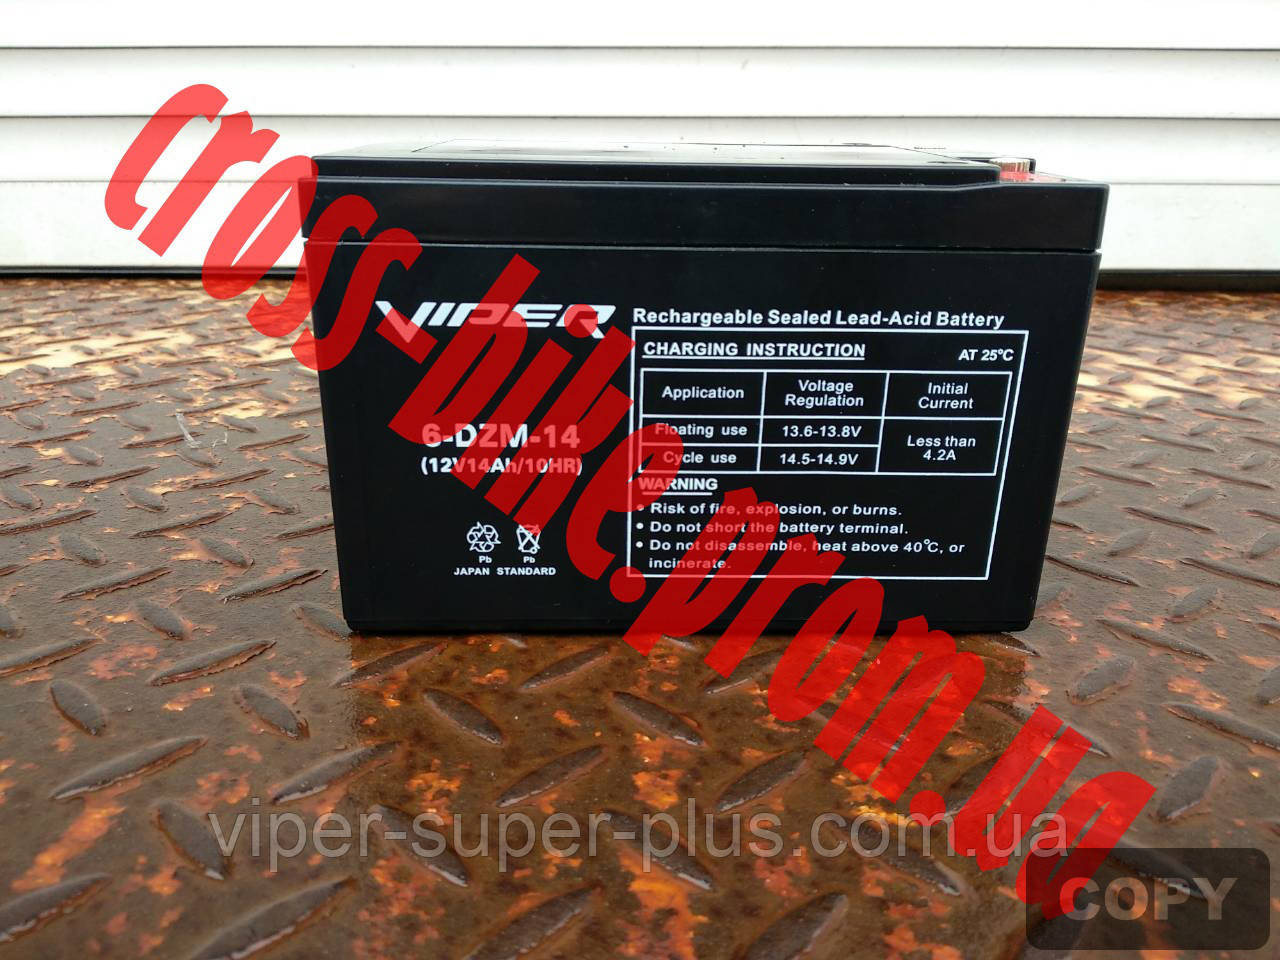 90304 (CROSSER) Батарея EATV 12V 14AH 2018 для дитячого квадроцикла Crosser - Viper